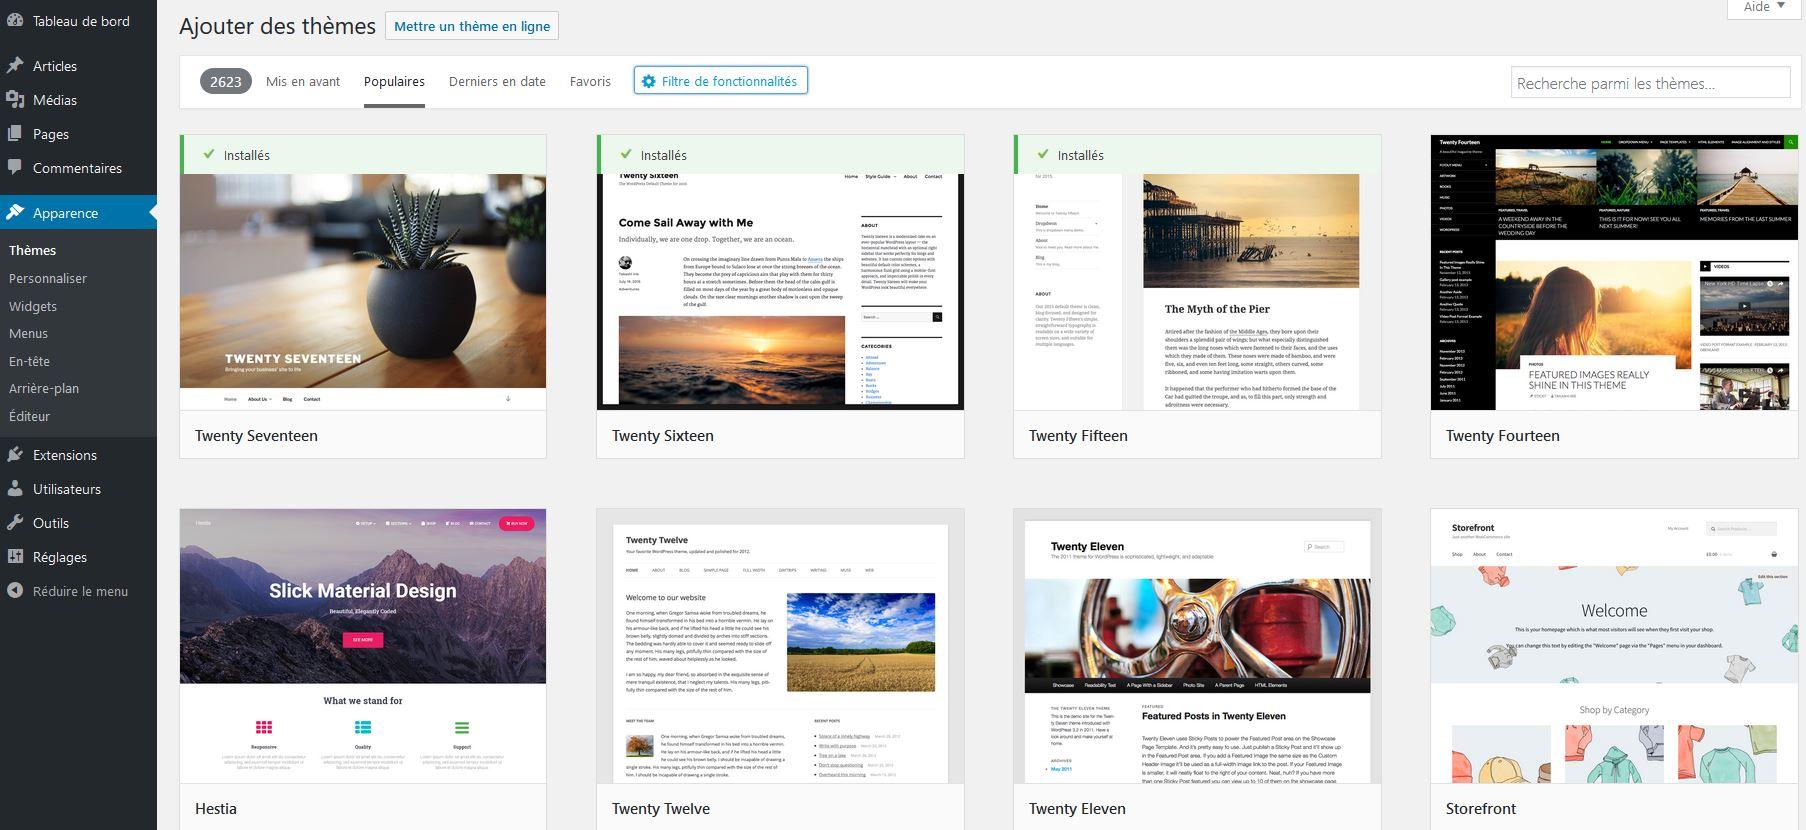 Thèmes gratuits dans WordPress